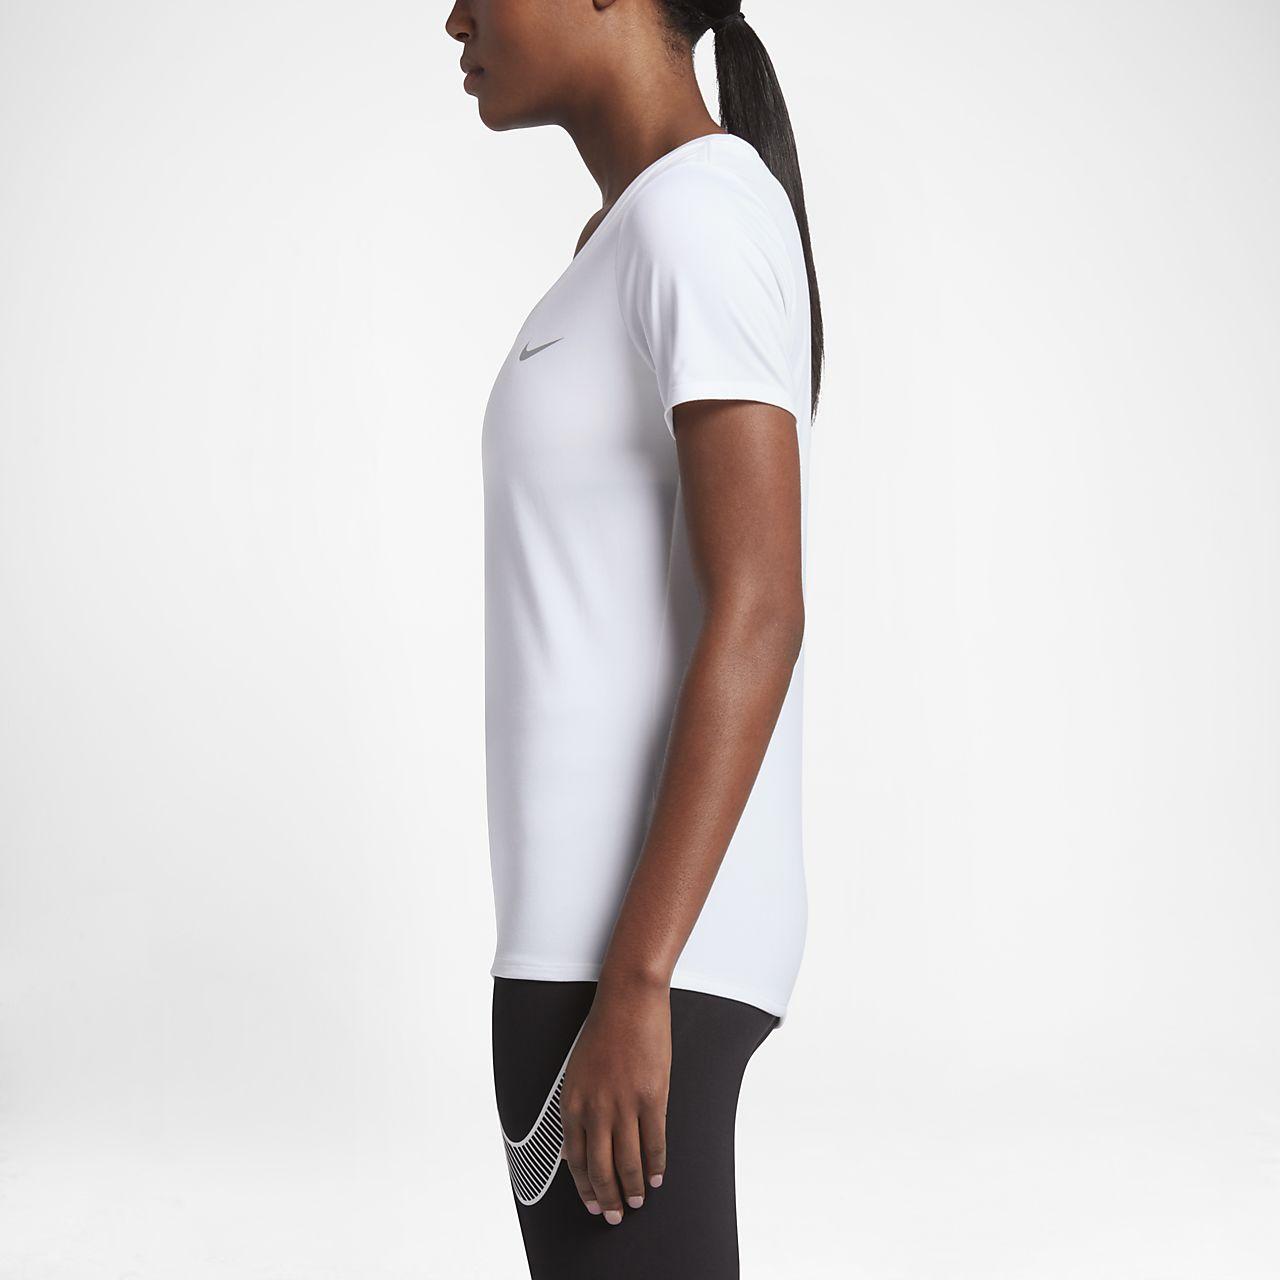 216fa63f434 Nike Dri-FIT Women s Training T-Shirt. Nike.com